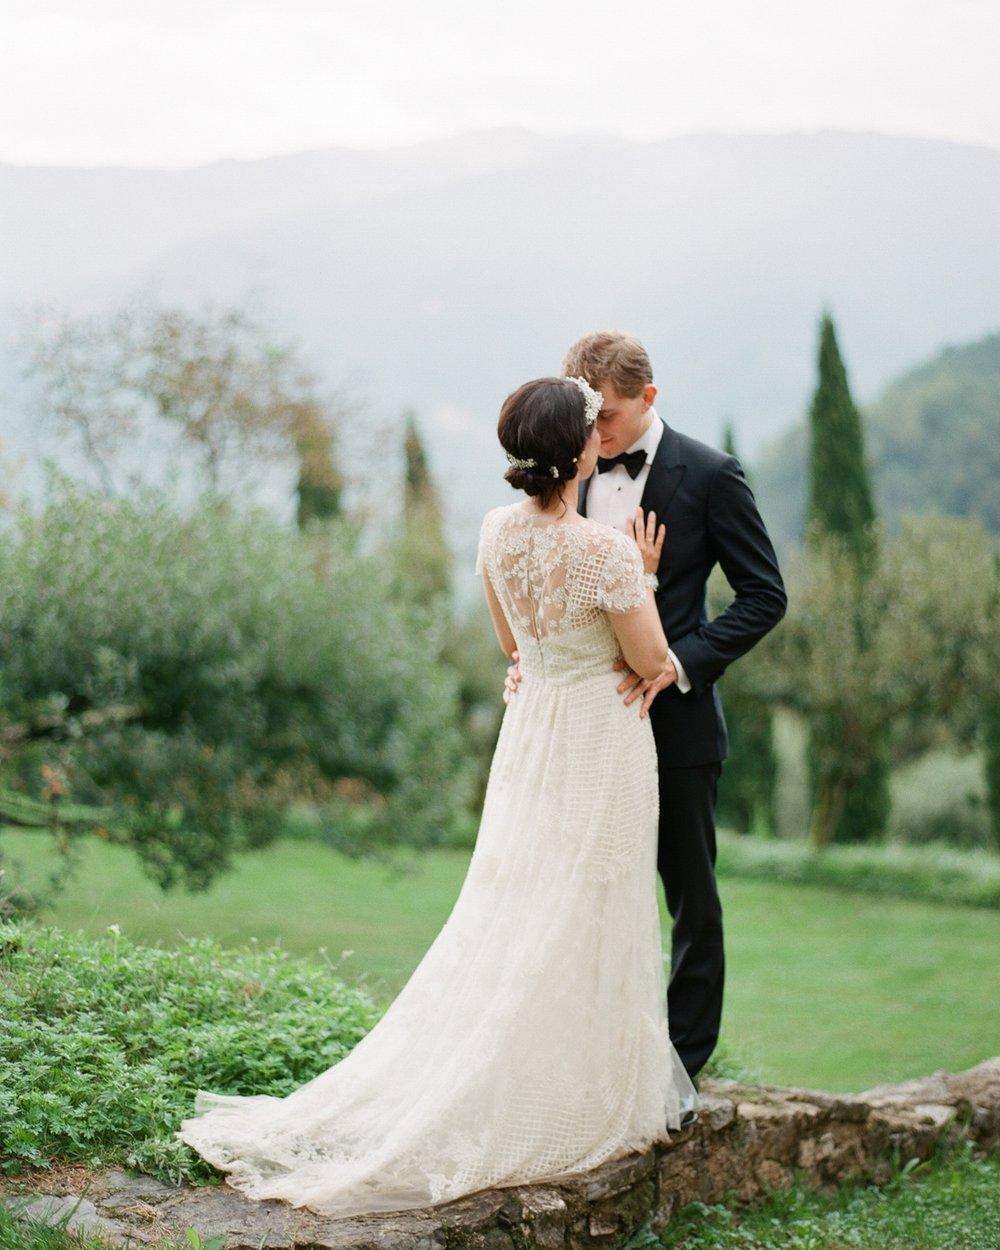 Patrick & Sara - LUCCA ITALY- WEDDING